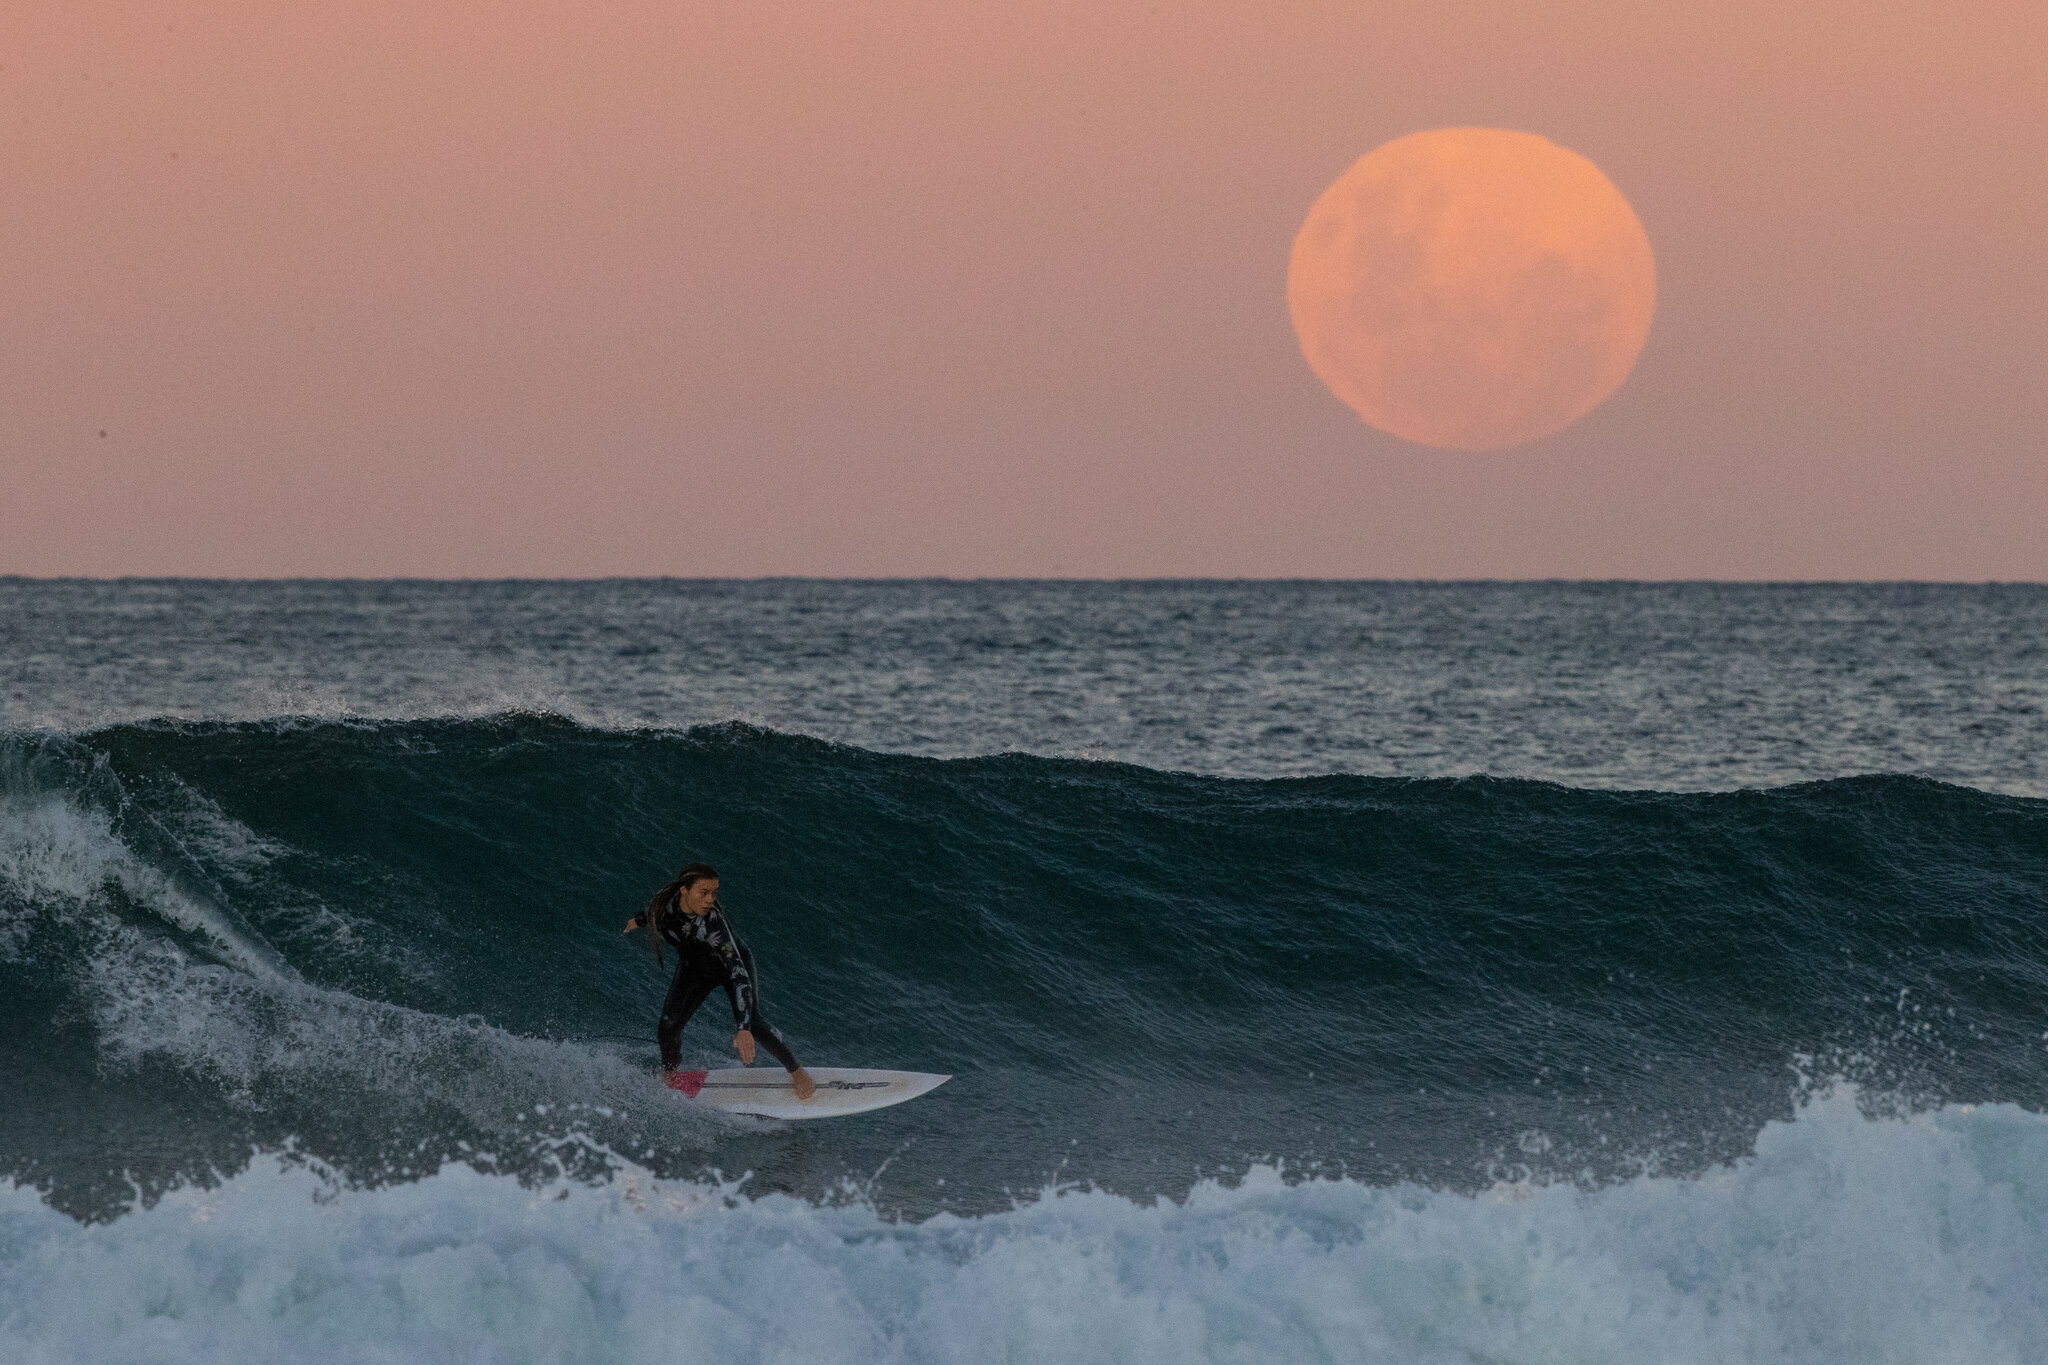 Видео дня. «Цветочная Луна» на Гавайях